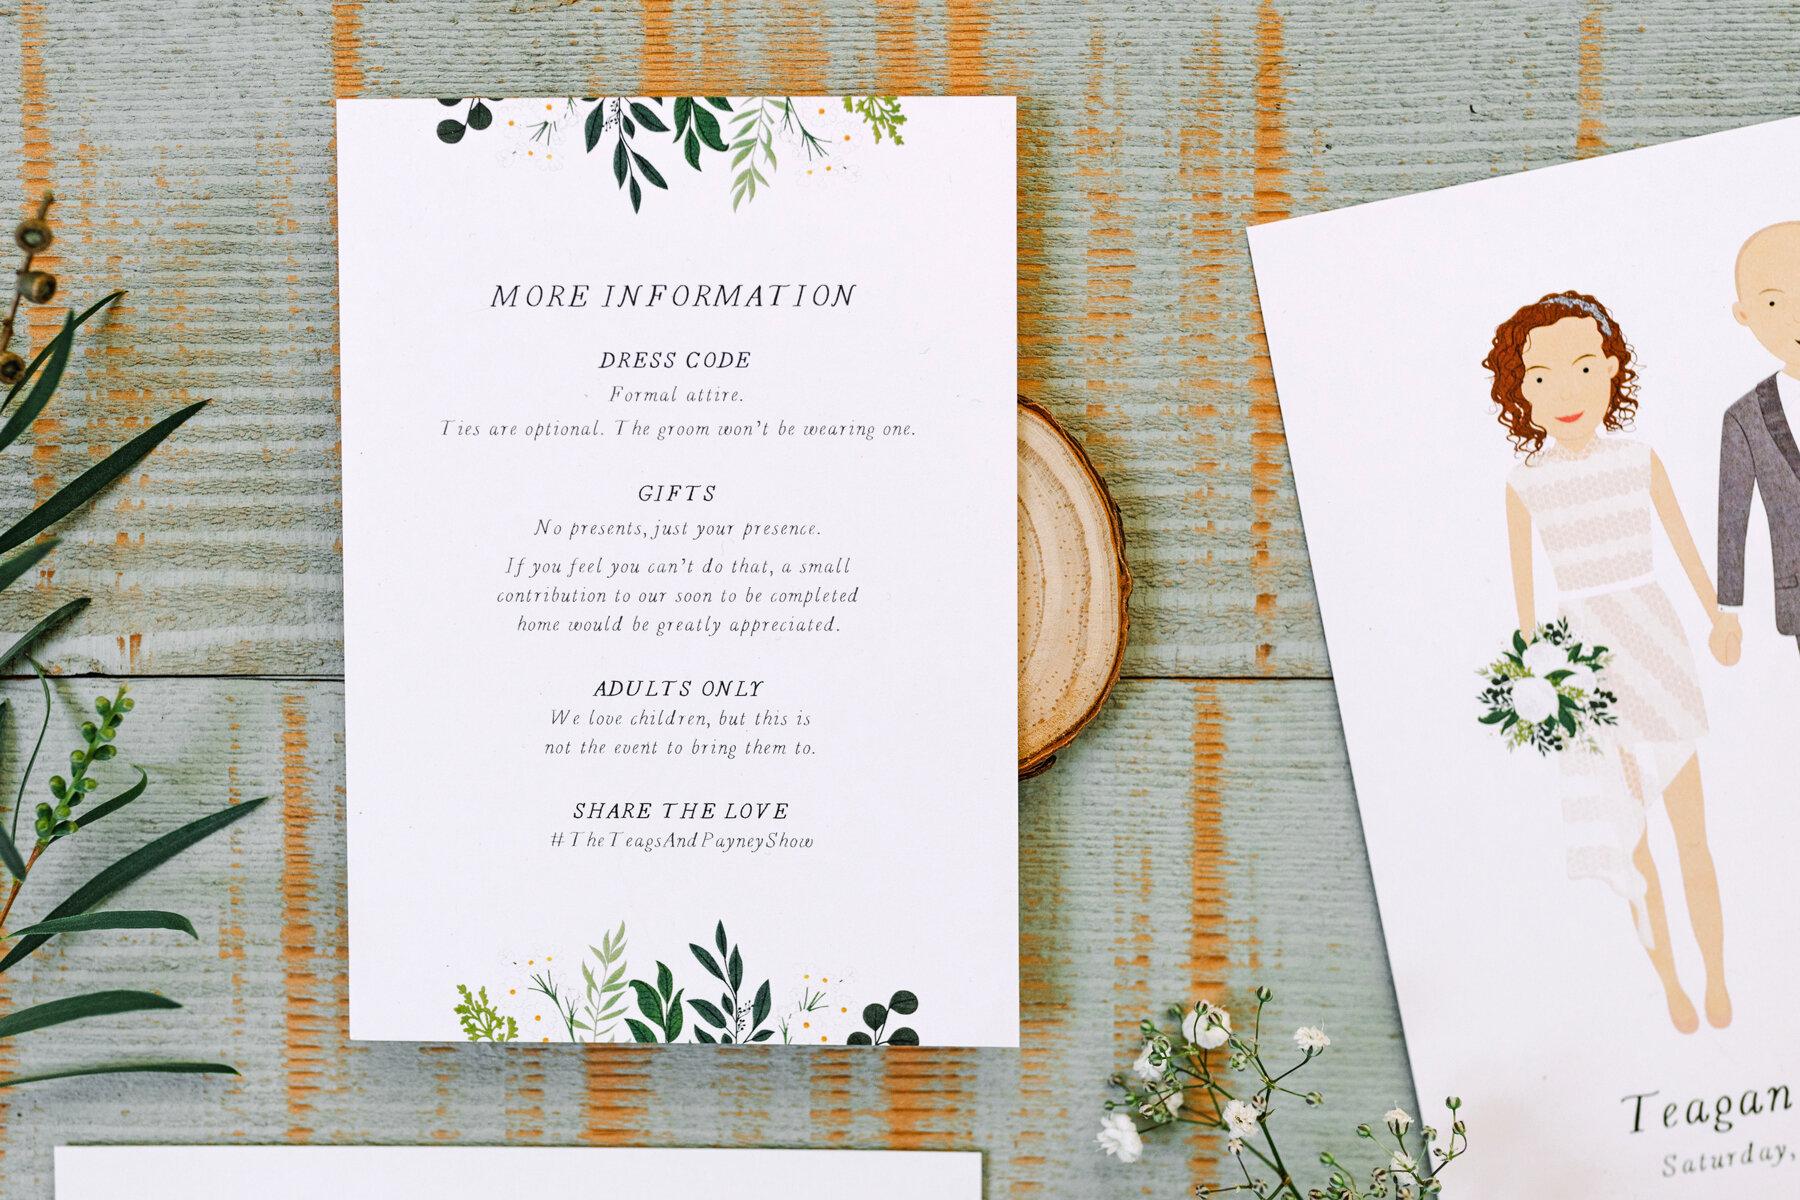 Wedding Invitation Wording Adults Only Love Carli Wedding Stationery Signage Pretty Paper Goods